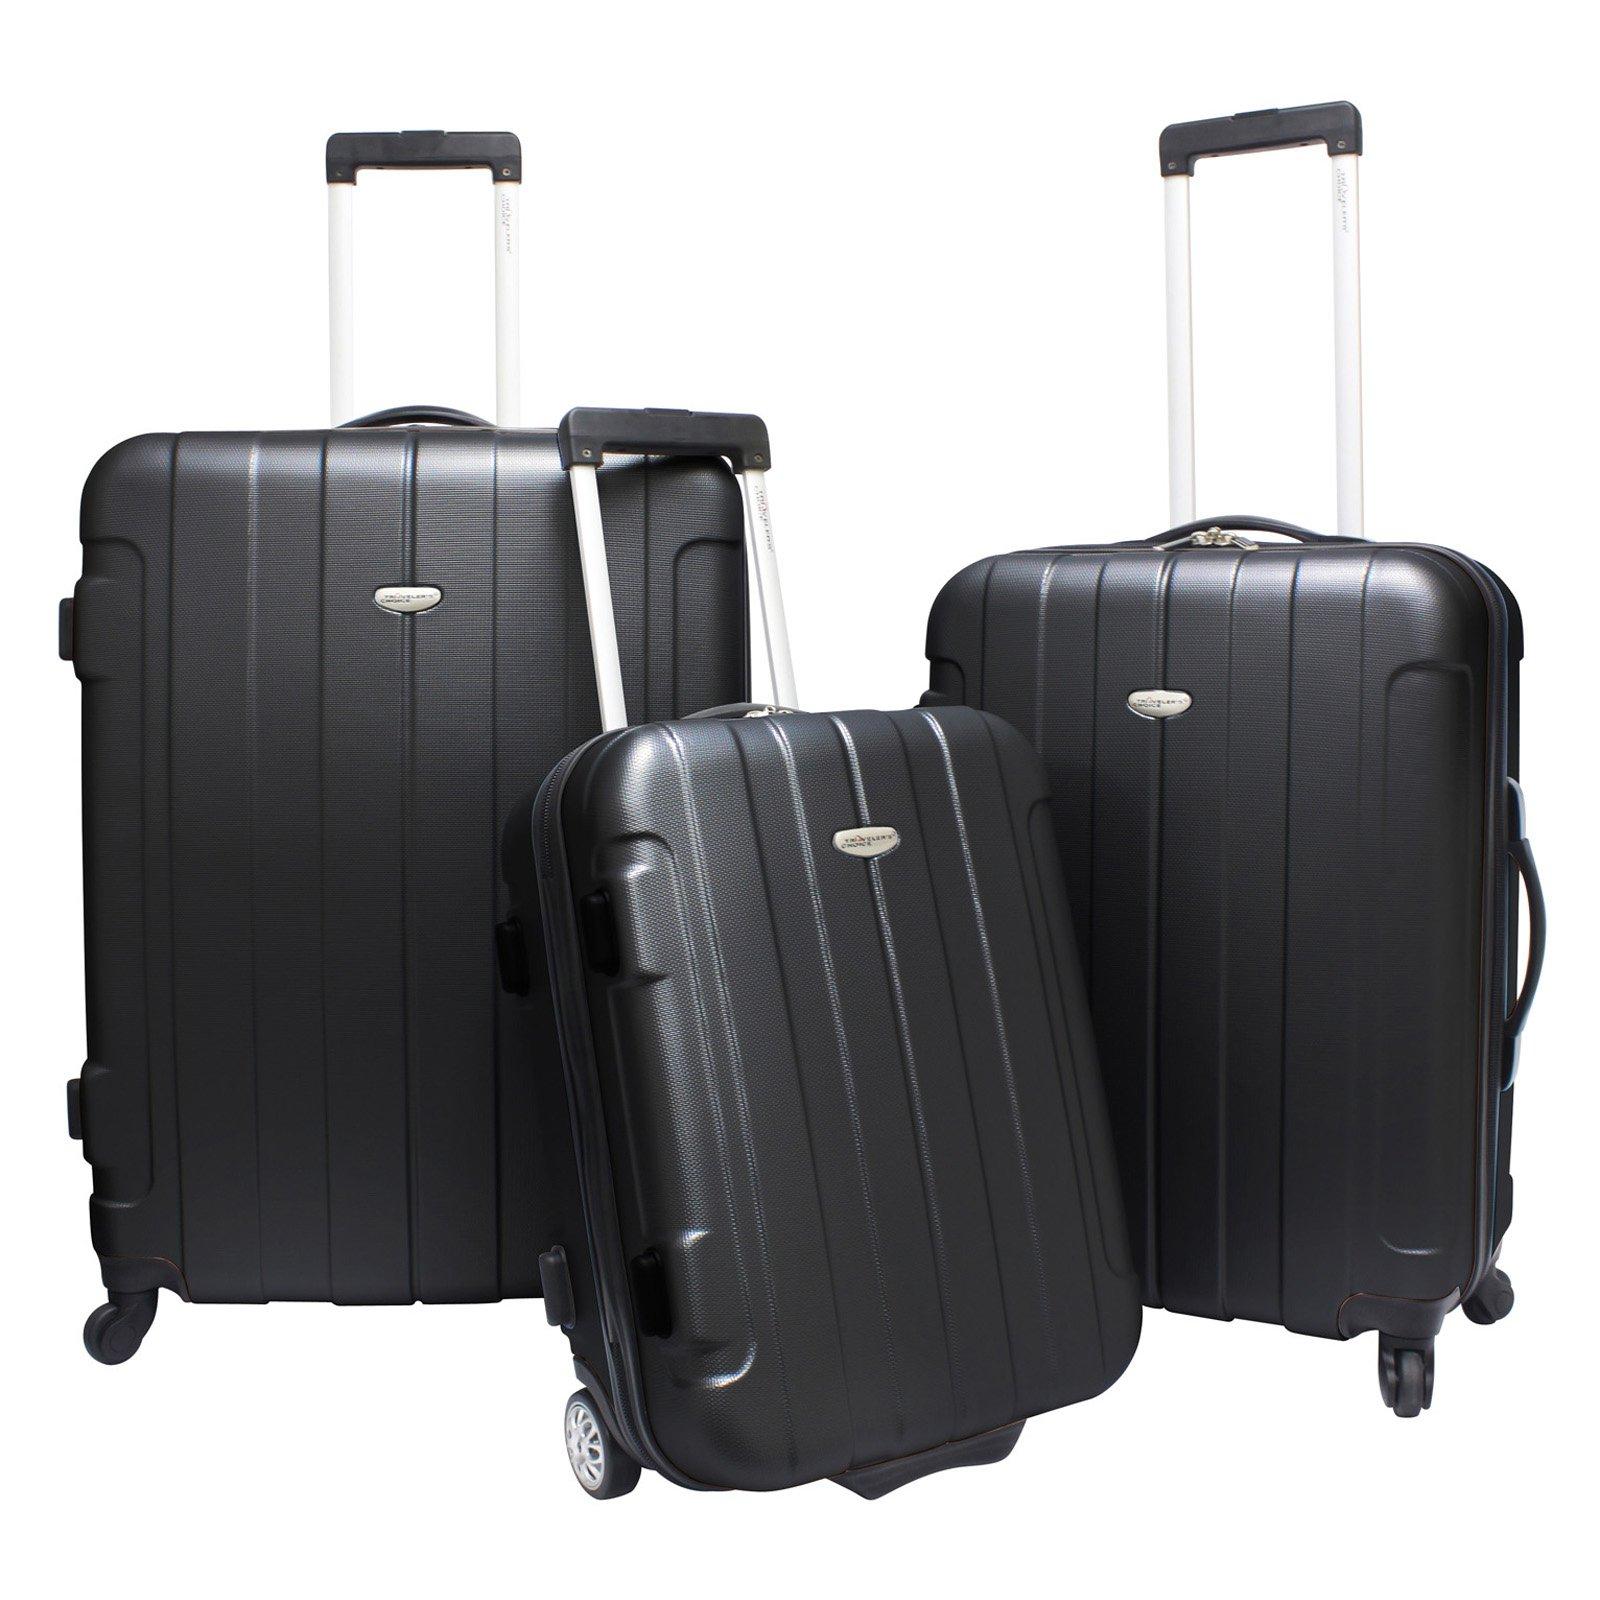 Travelers Choice Rome 3 Piece Lightweight Hardside Spinner & Roller Luggage Set